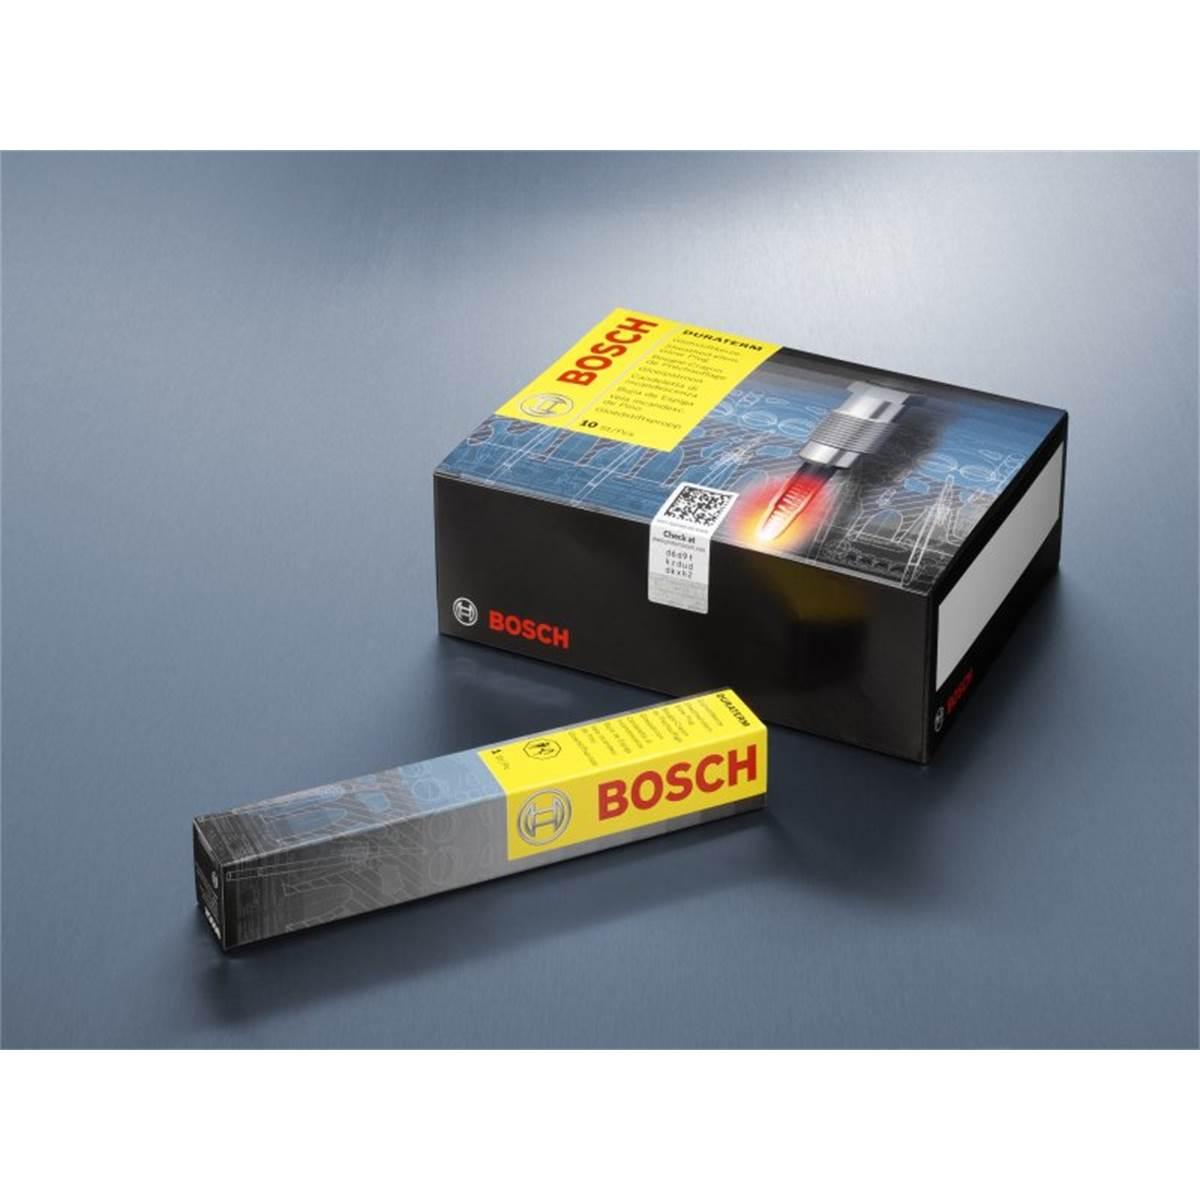 Bougie de préchauffage Bosch N°2129